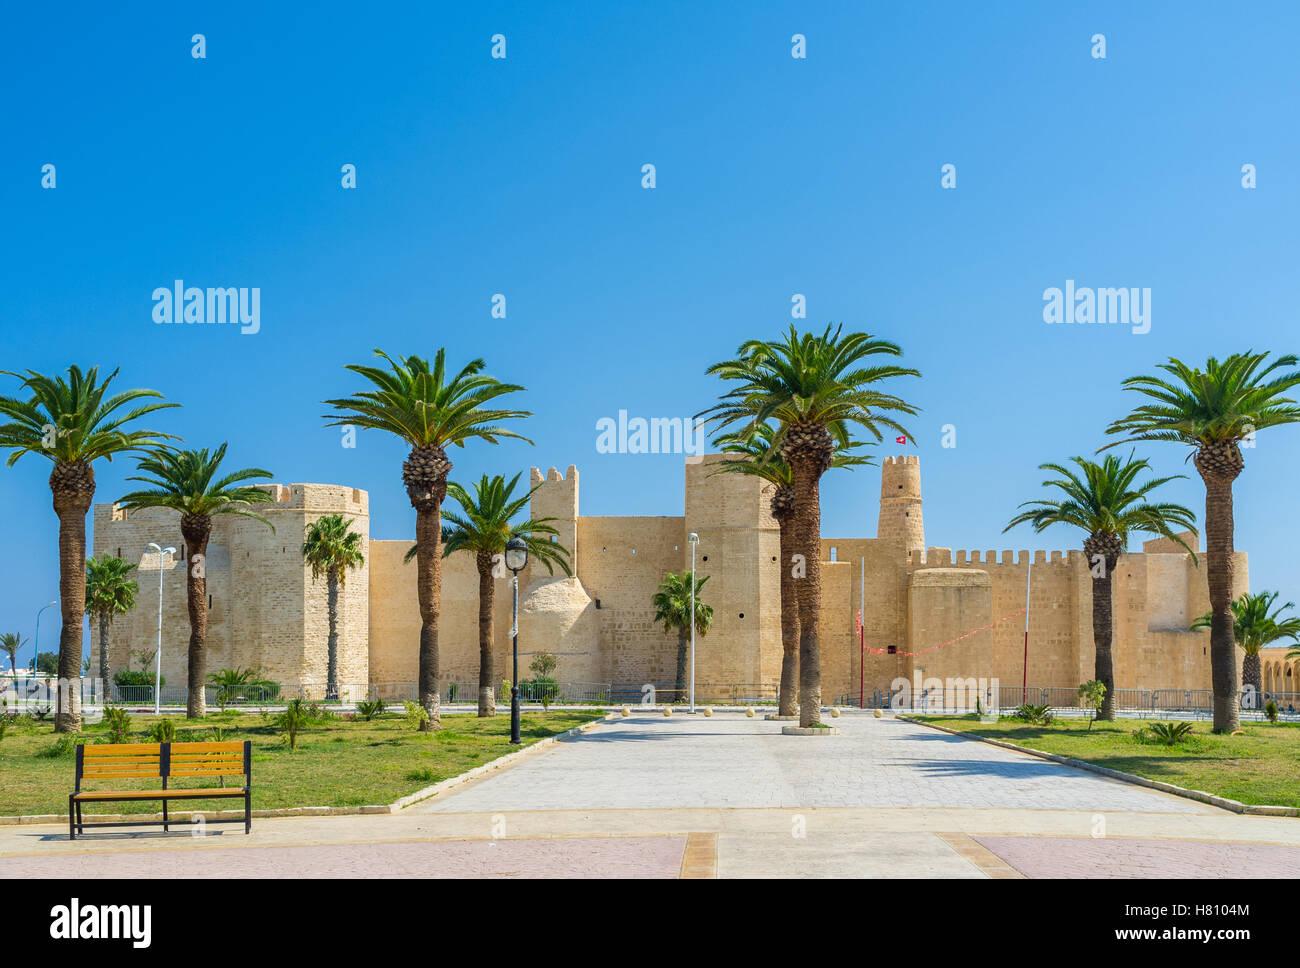 Ribat forteresse est la carte de visite de Monastir, Tunisie. Photo Stock